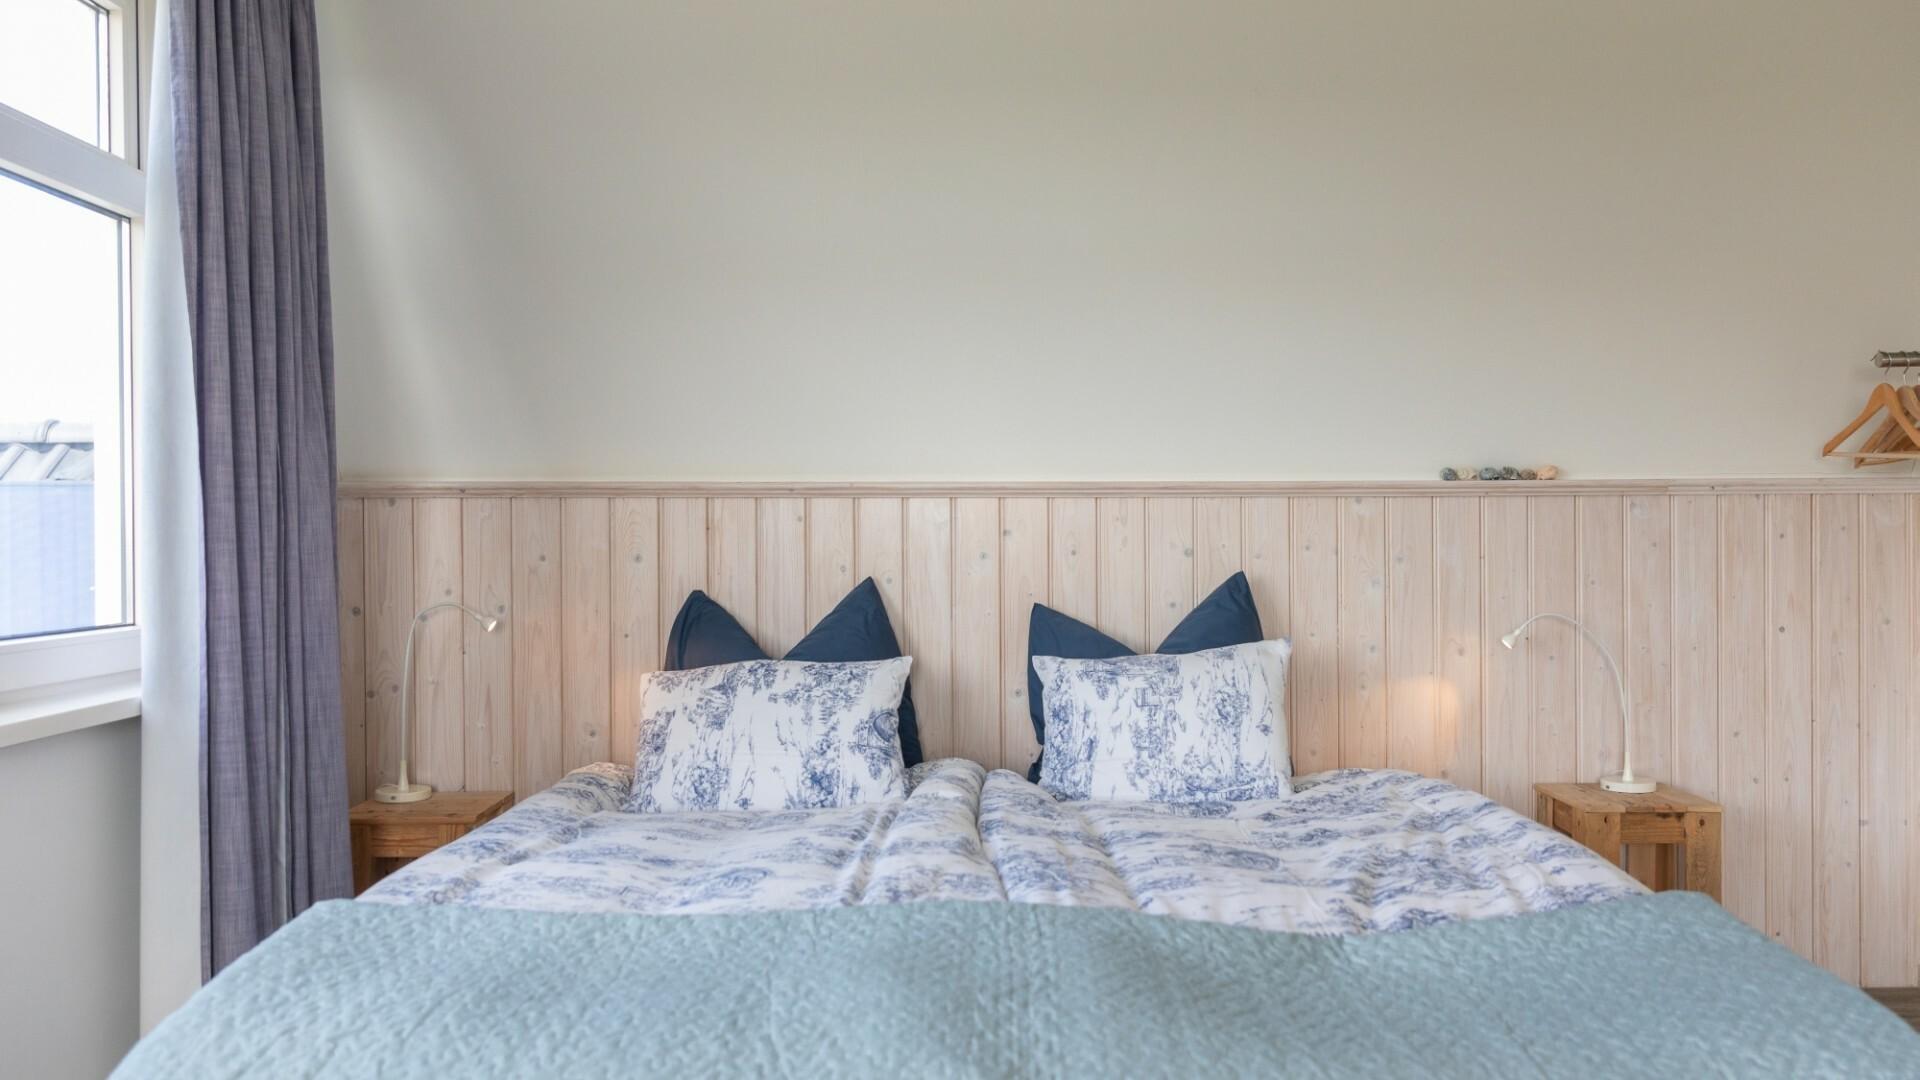 Slaapkamer bed en breakfast Wad Uniek VVV Texel